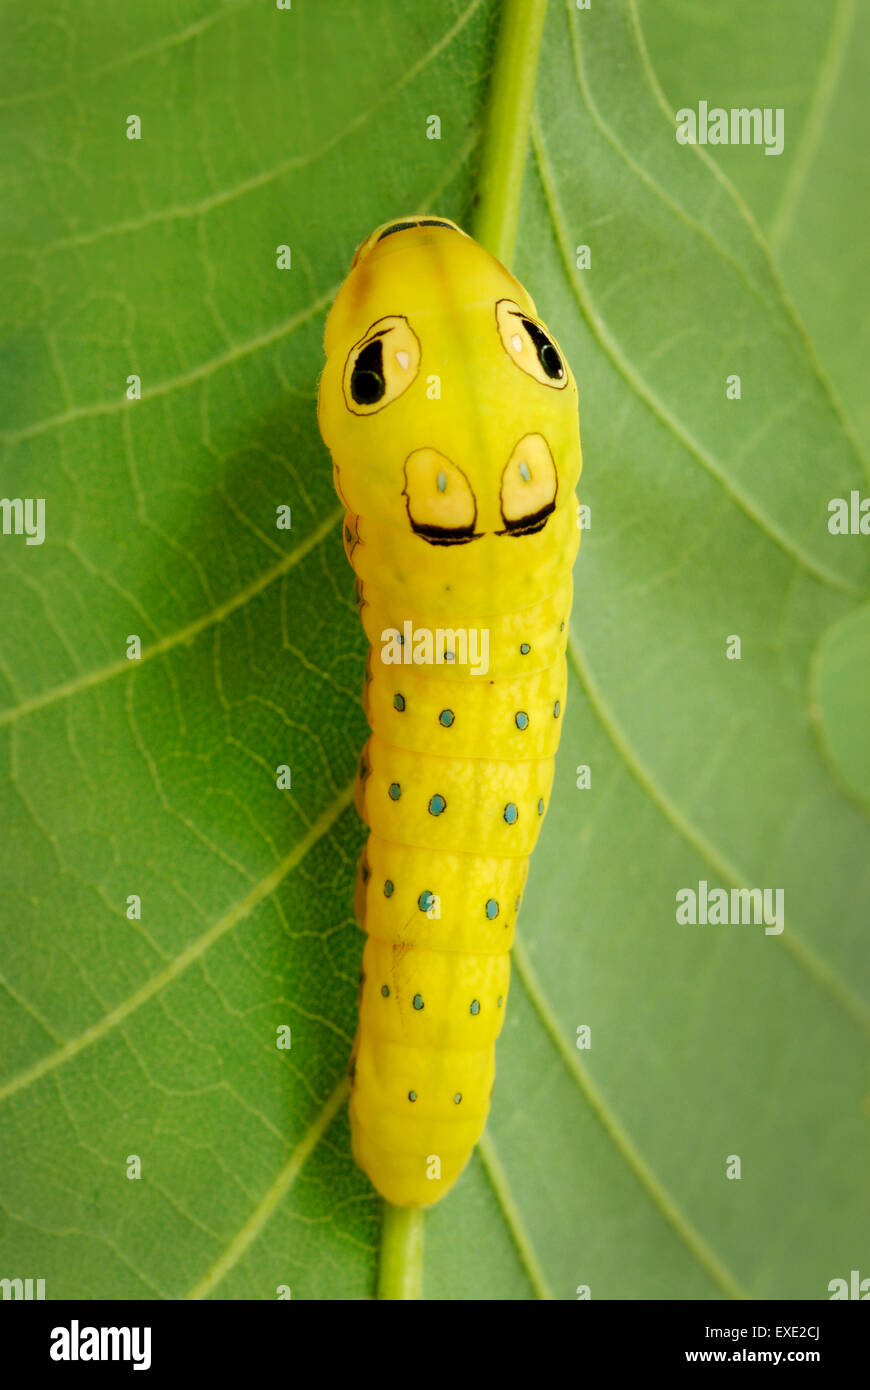 Especie Spicebush, Papilio Troilo, Caterpillar en final prepupal instar. Snake imitar con falsos ojo-spots Foto de stock